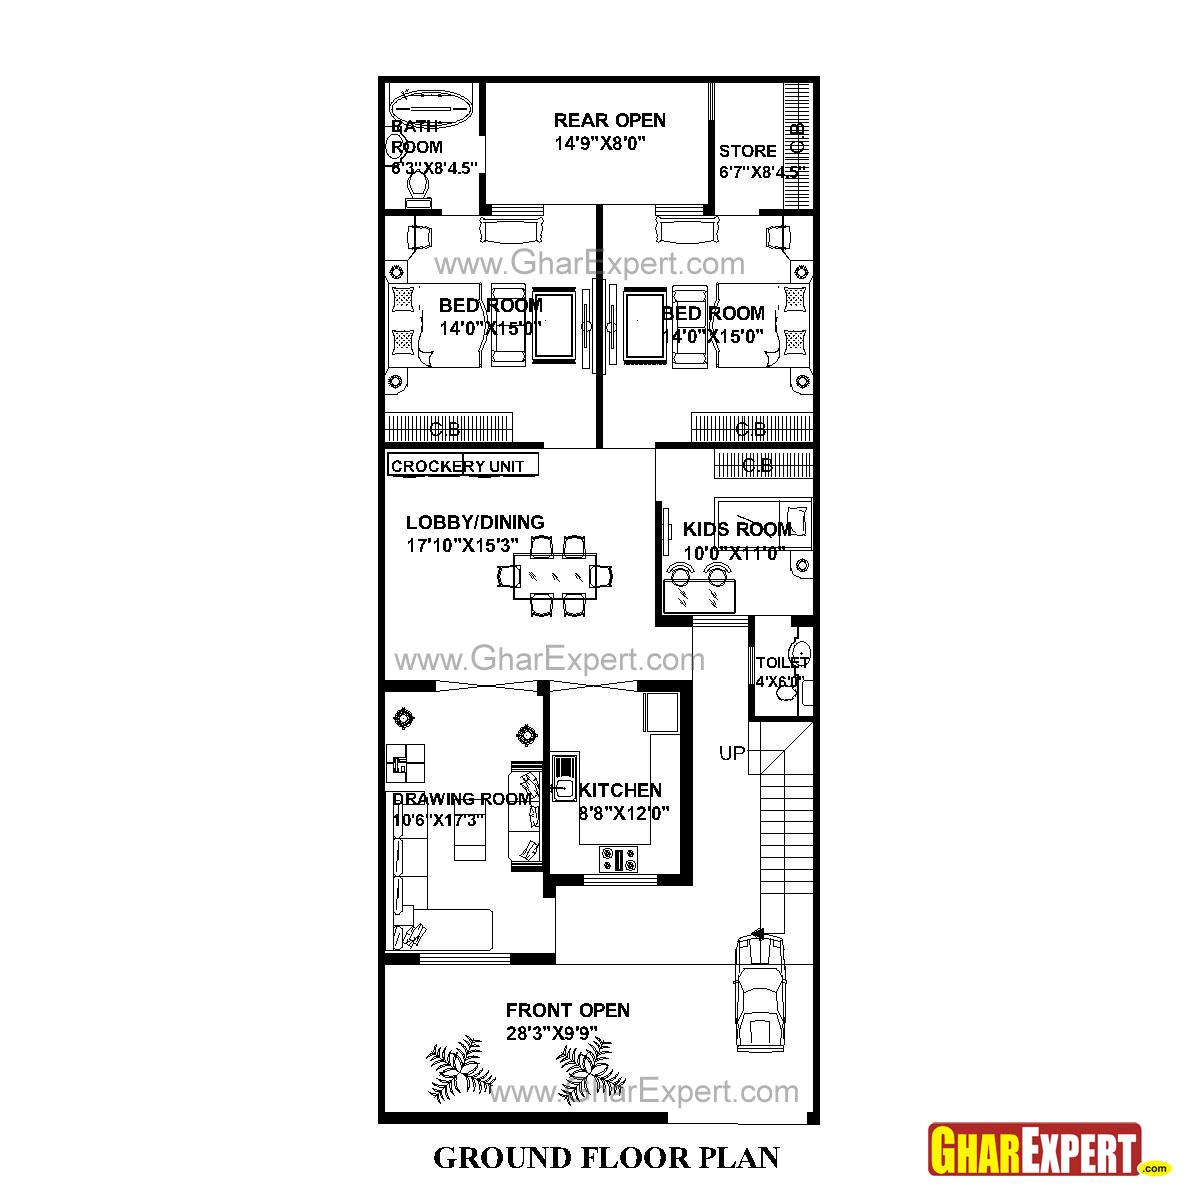 House Plan for 29 Feet by 69 Feet plot (Plot Size 222